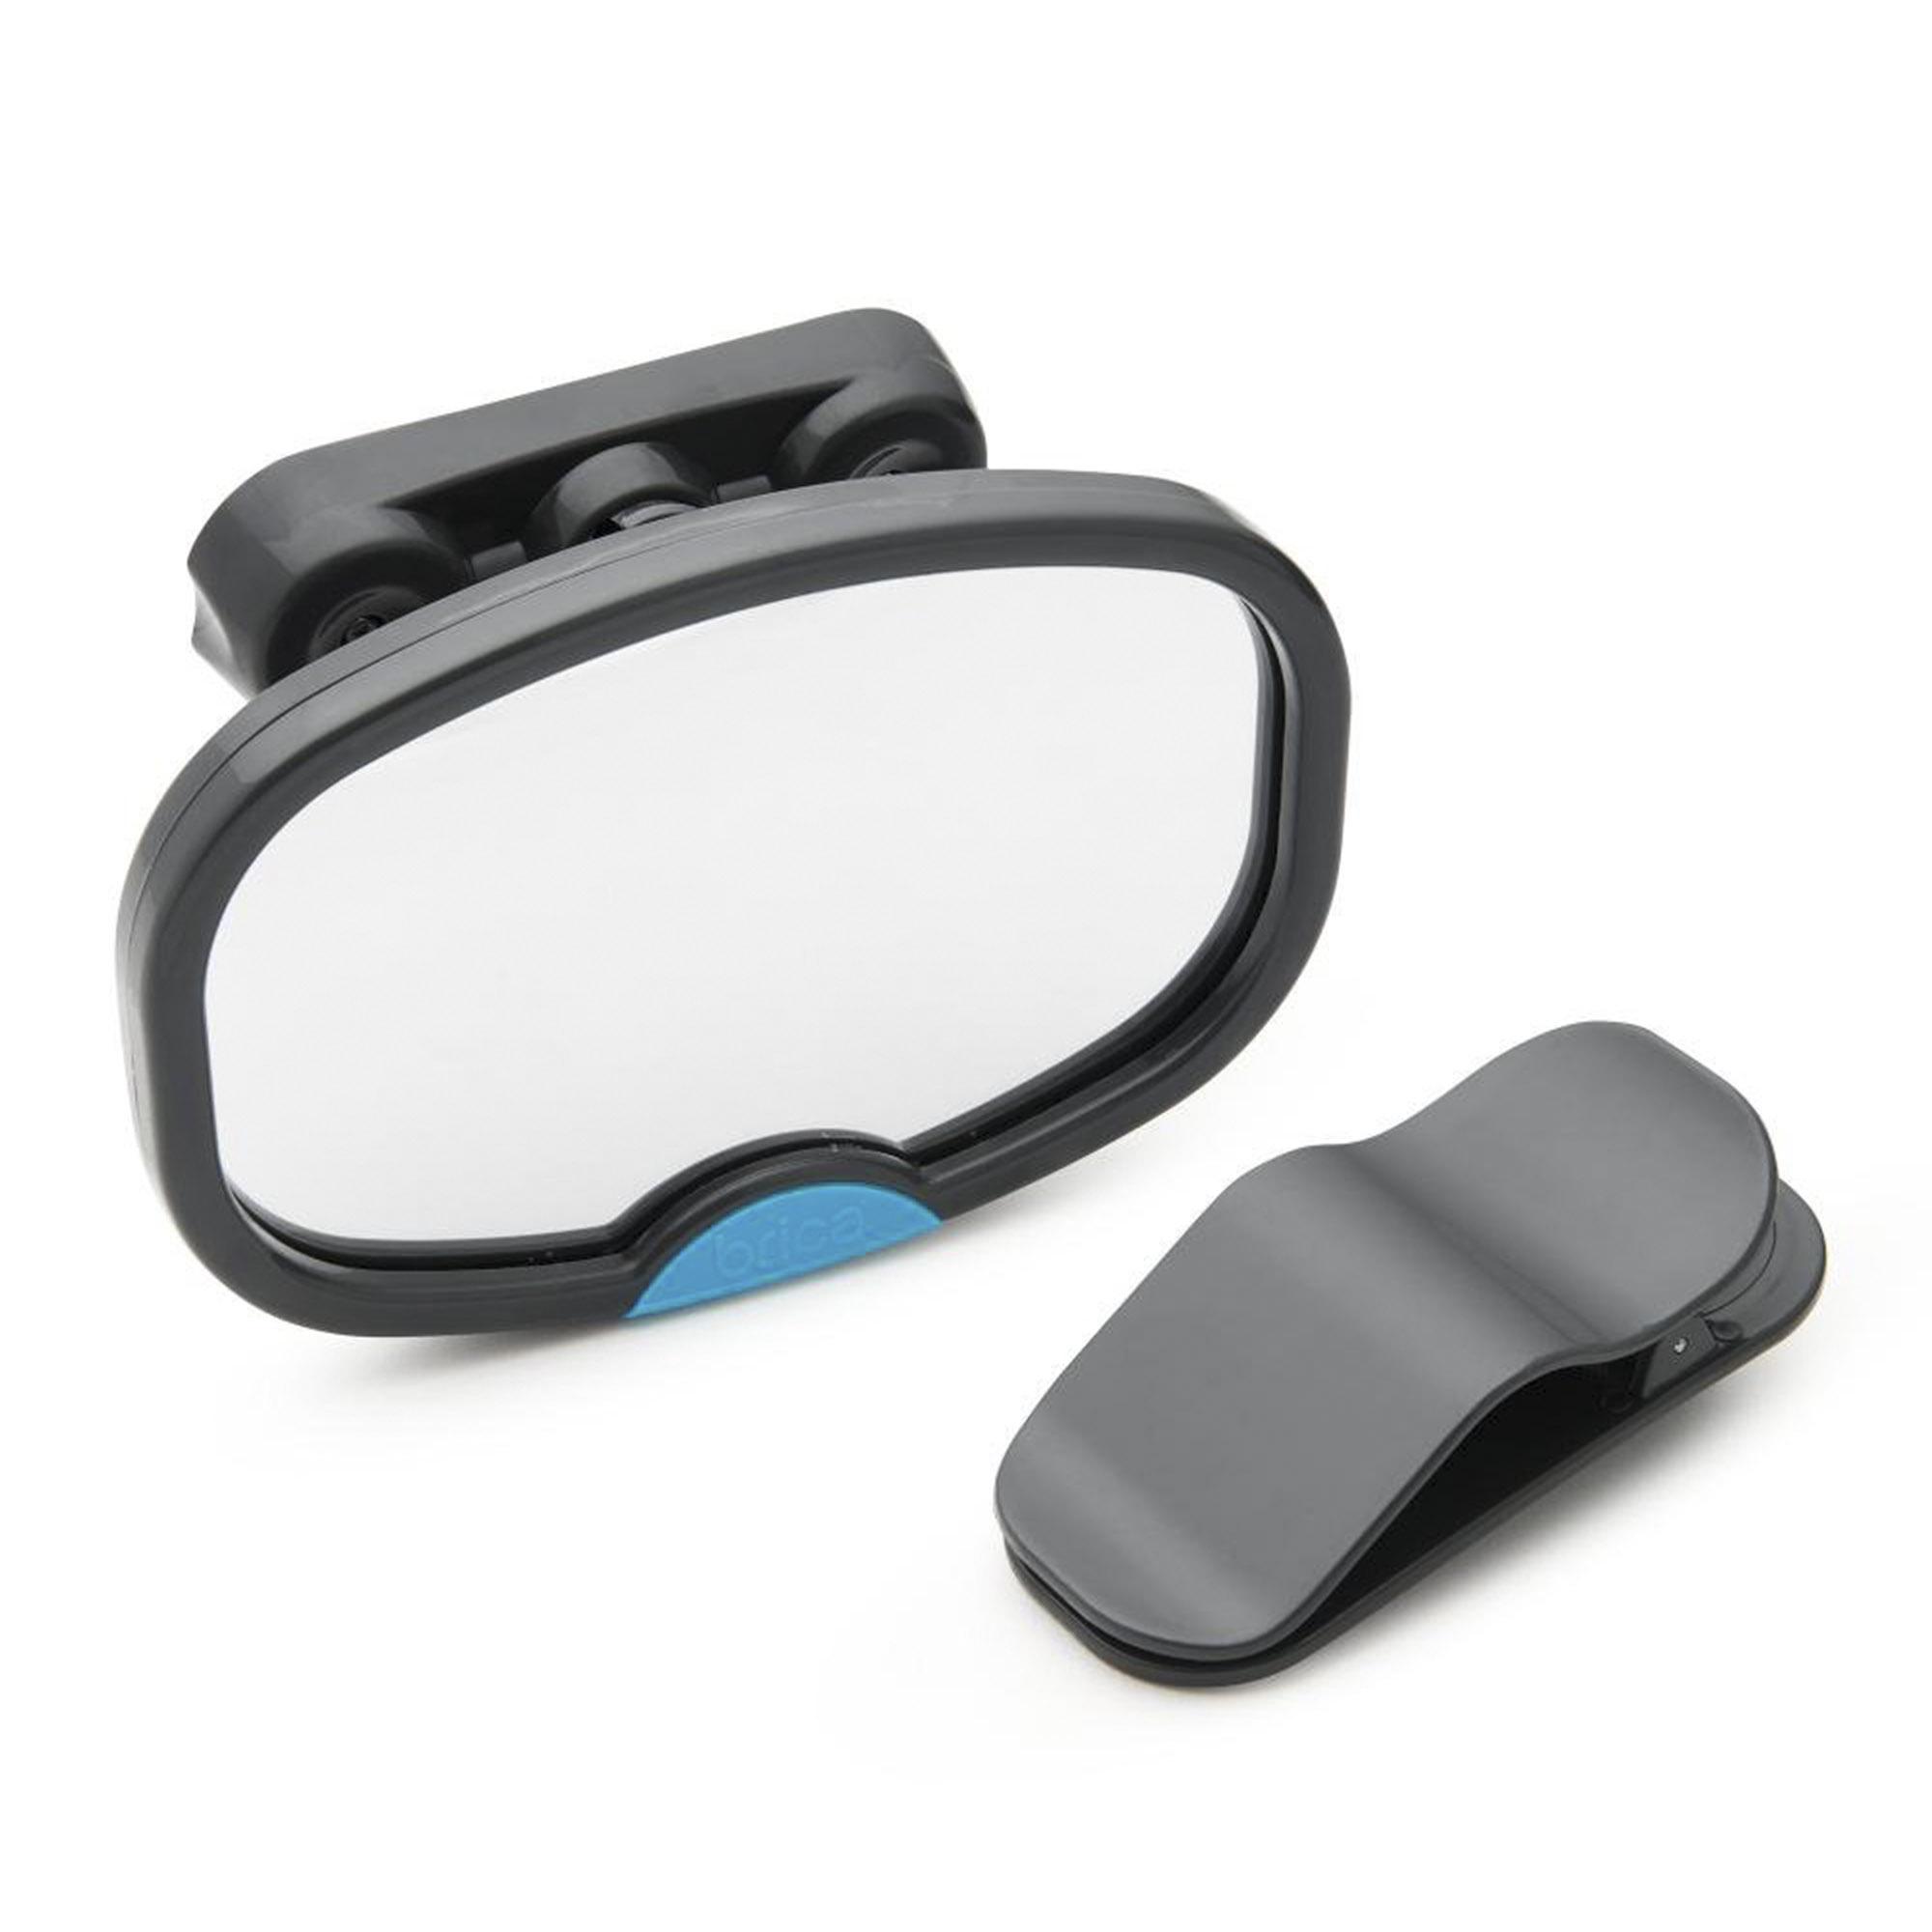 Зеркало контроля за ребёнком в автомобиле Brica Munchkin Dual Sigh Mirror аксессуары для автомобиля munchkin brica зеркало контроля за ребёнком в автомобиле baby in sight mega mirror